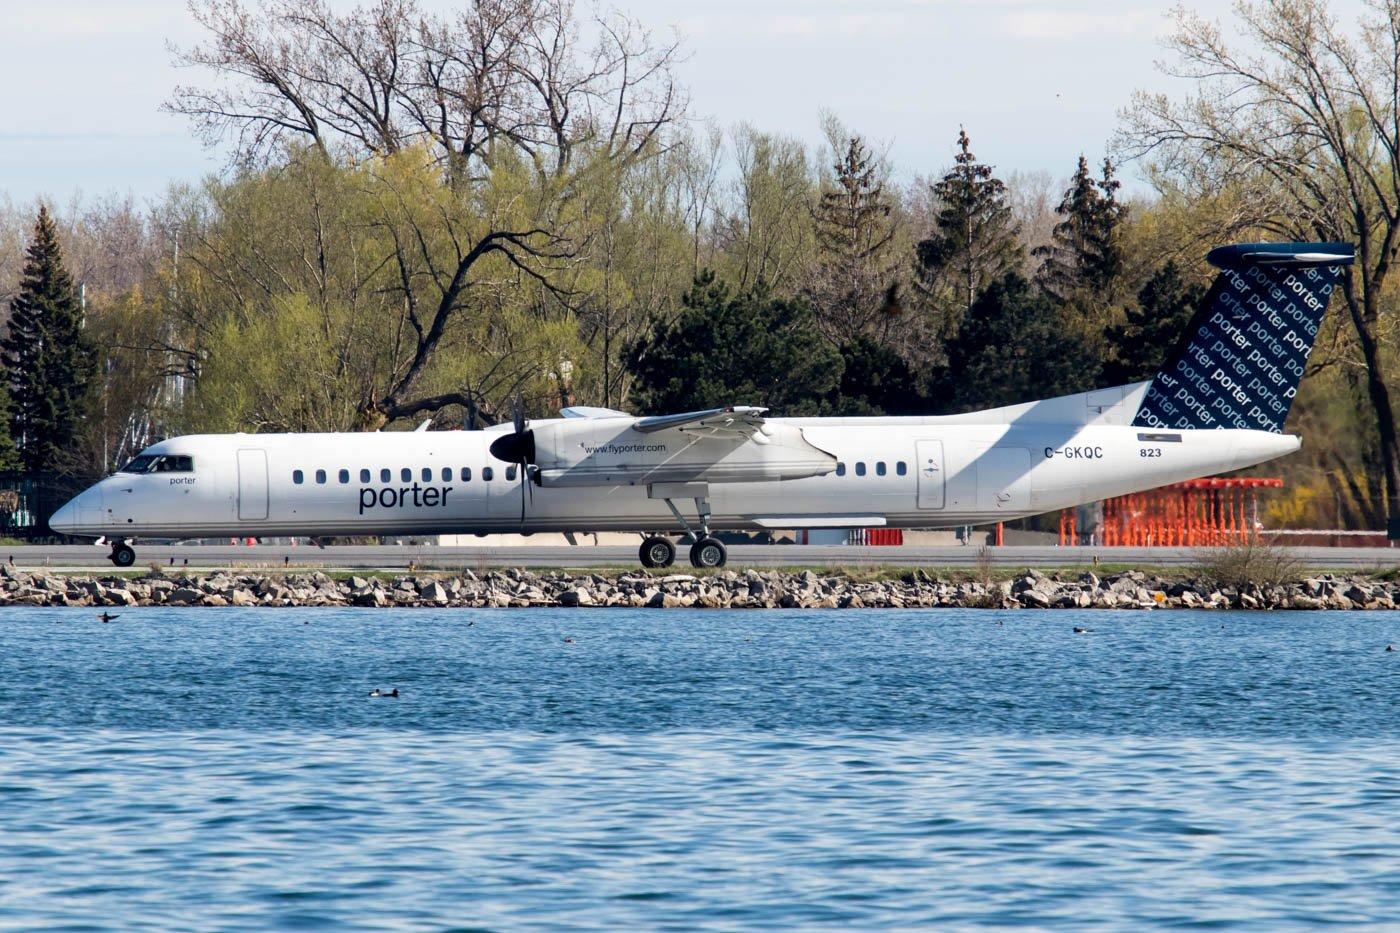 Porter Airlines Dash 8 Billy Bishop Toronto City Airport